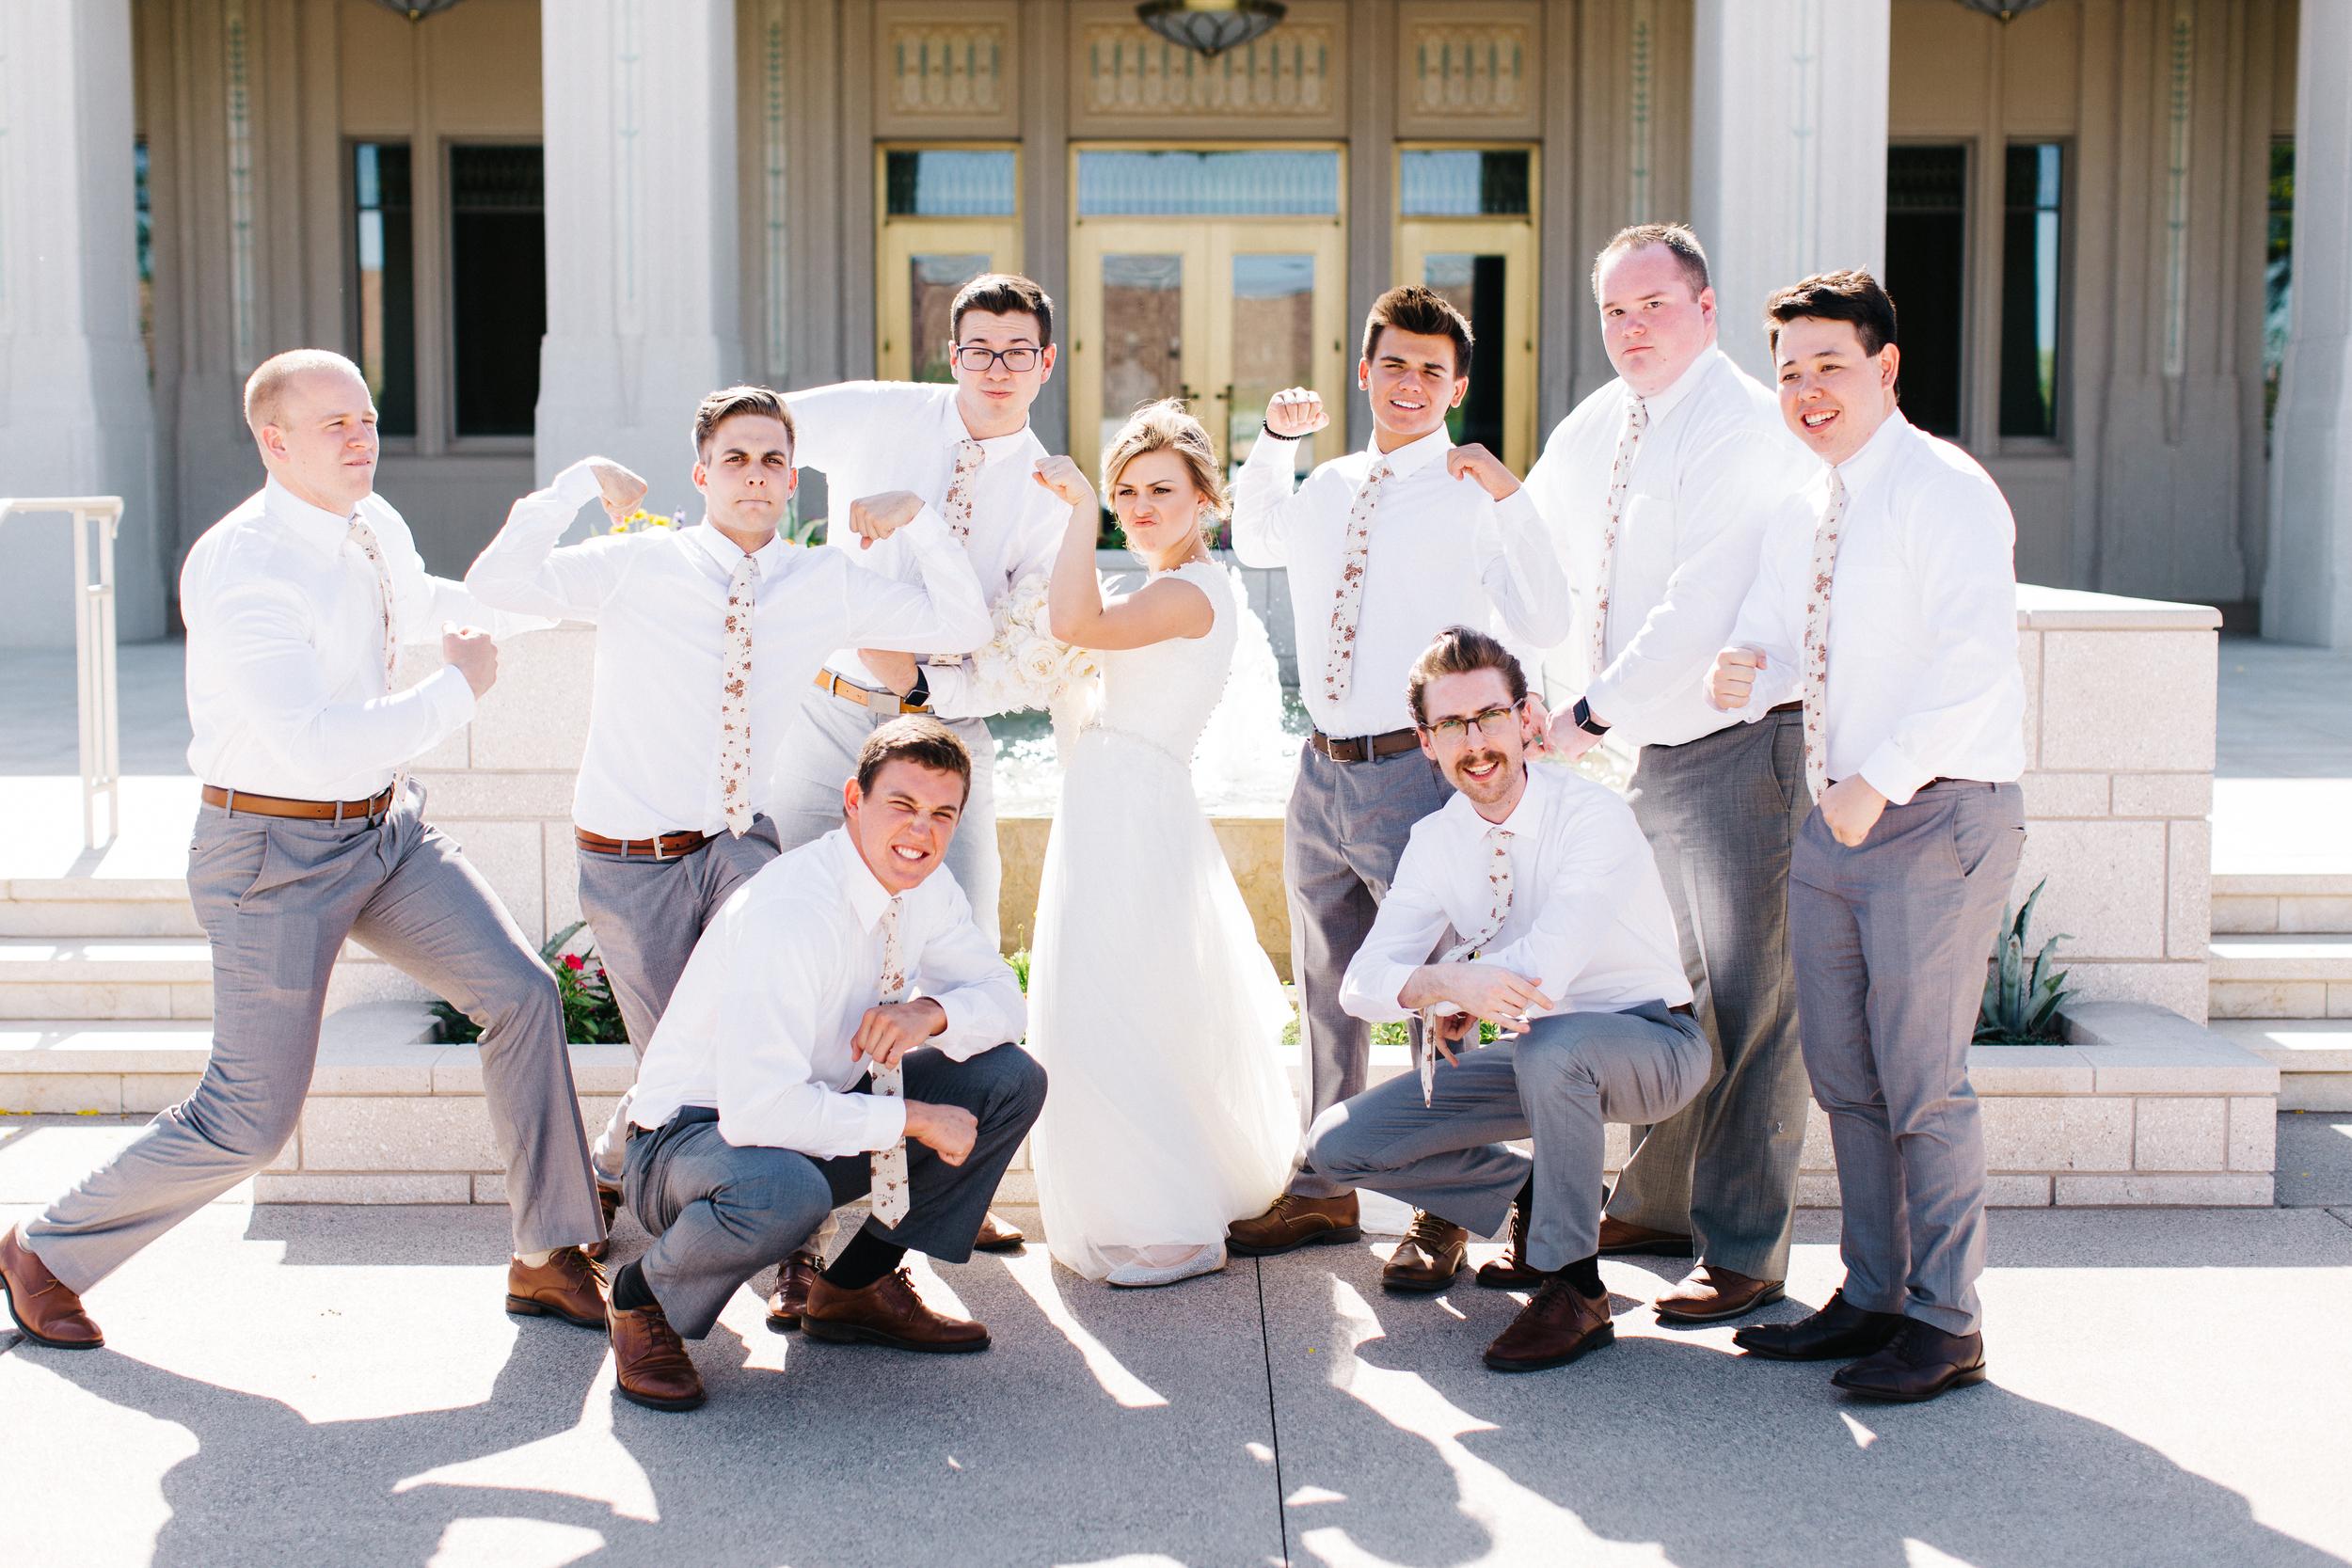 KennedyWyatt_WeddingDay-81.jpg